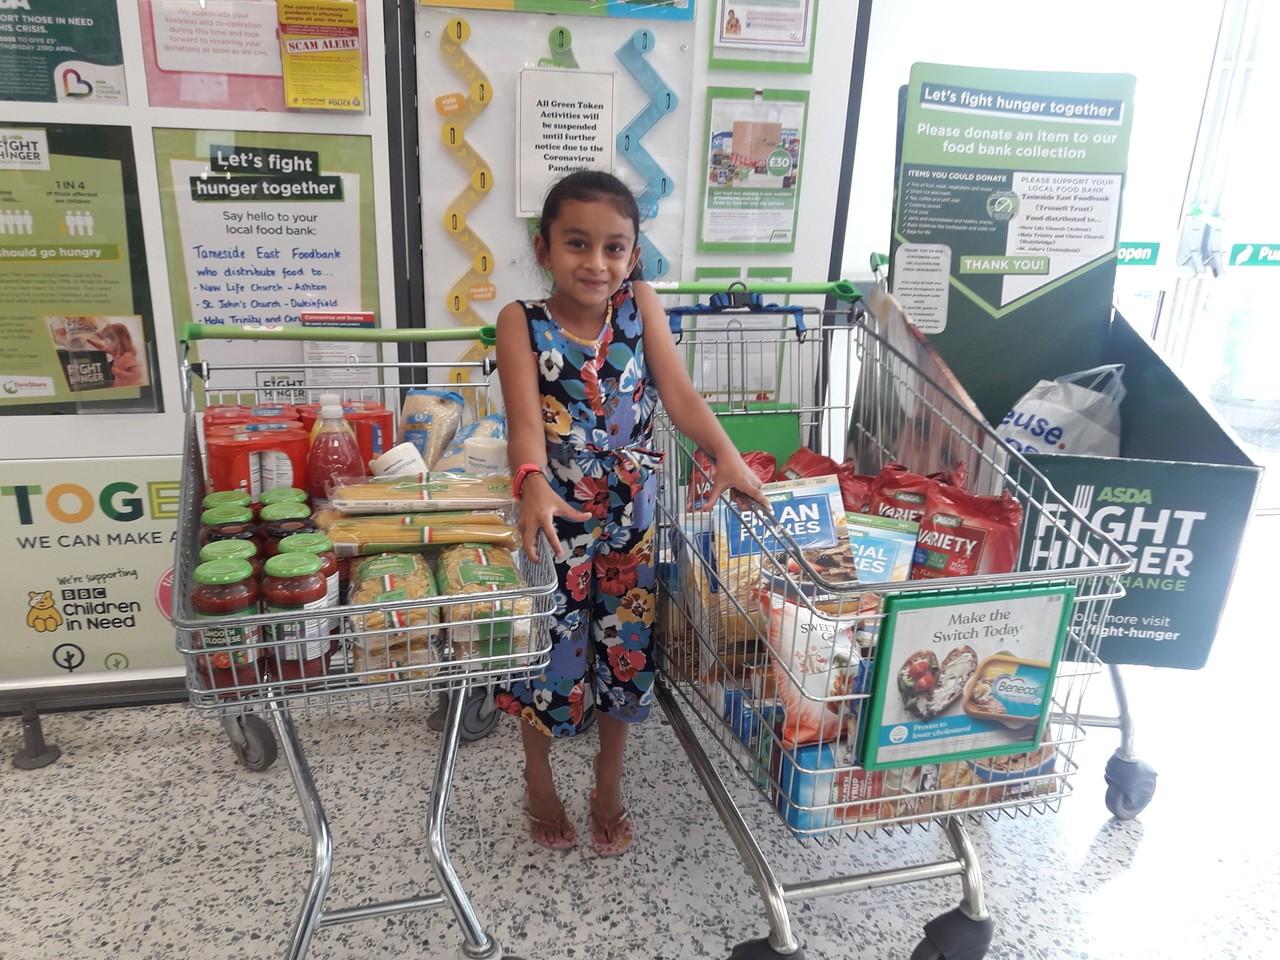 Kind hearted Naya helps food bank | Asda Ashton